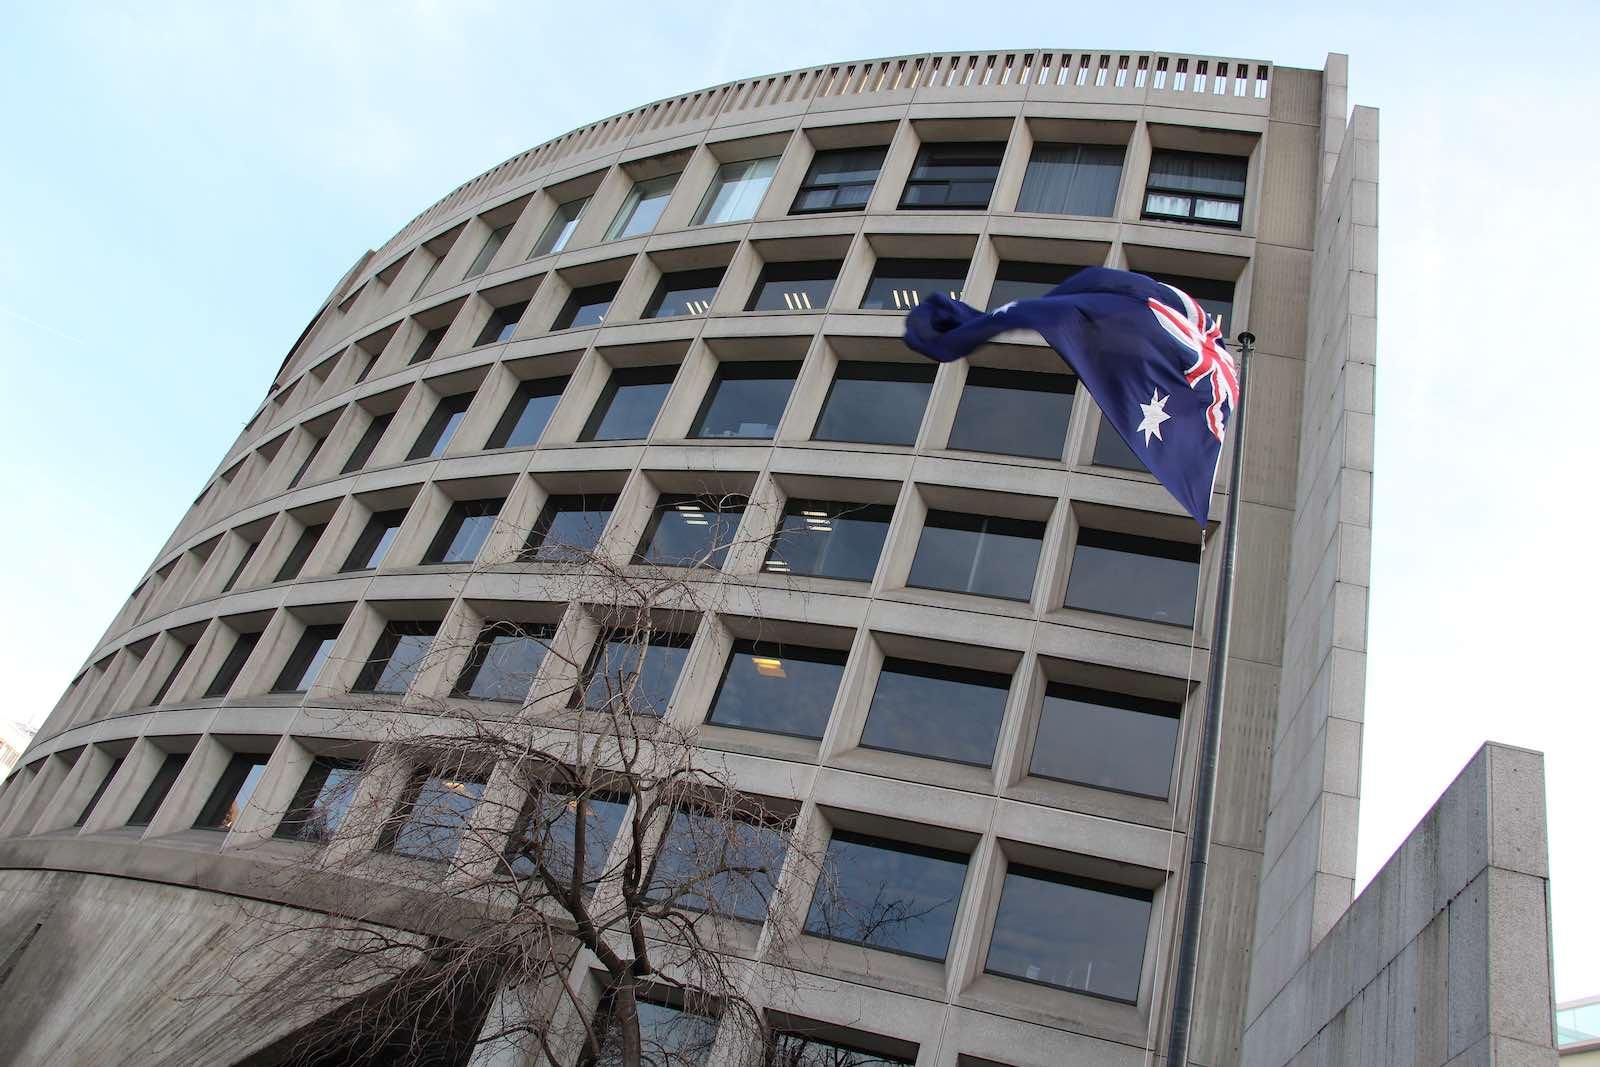 Australia's embassy in France, where former Liberal politician John Spender served as ambassador in the 1990s (Fred Romero/Flickr)